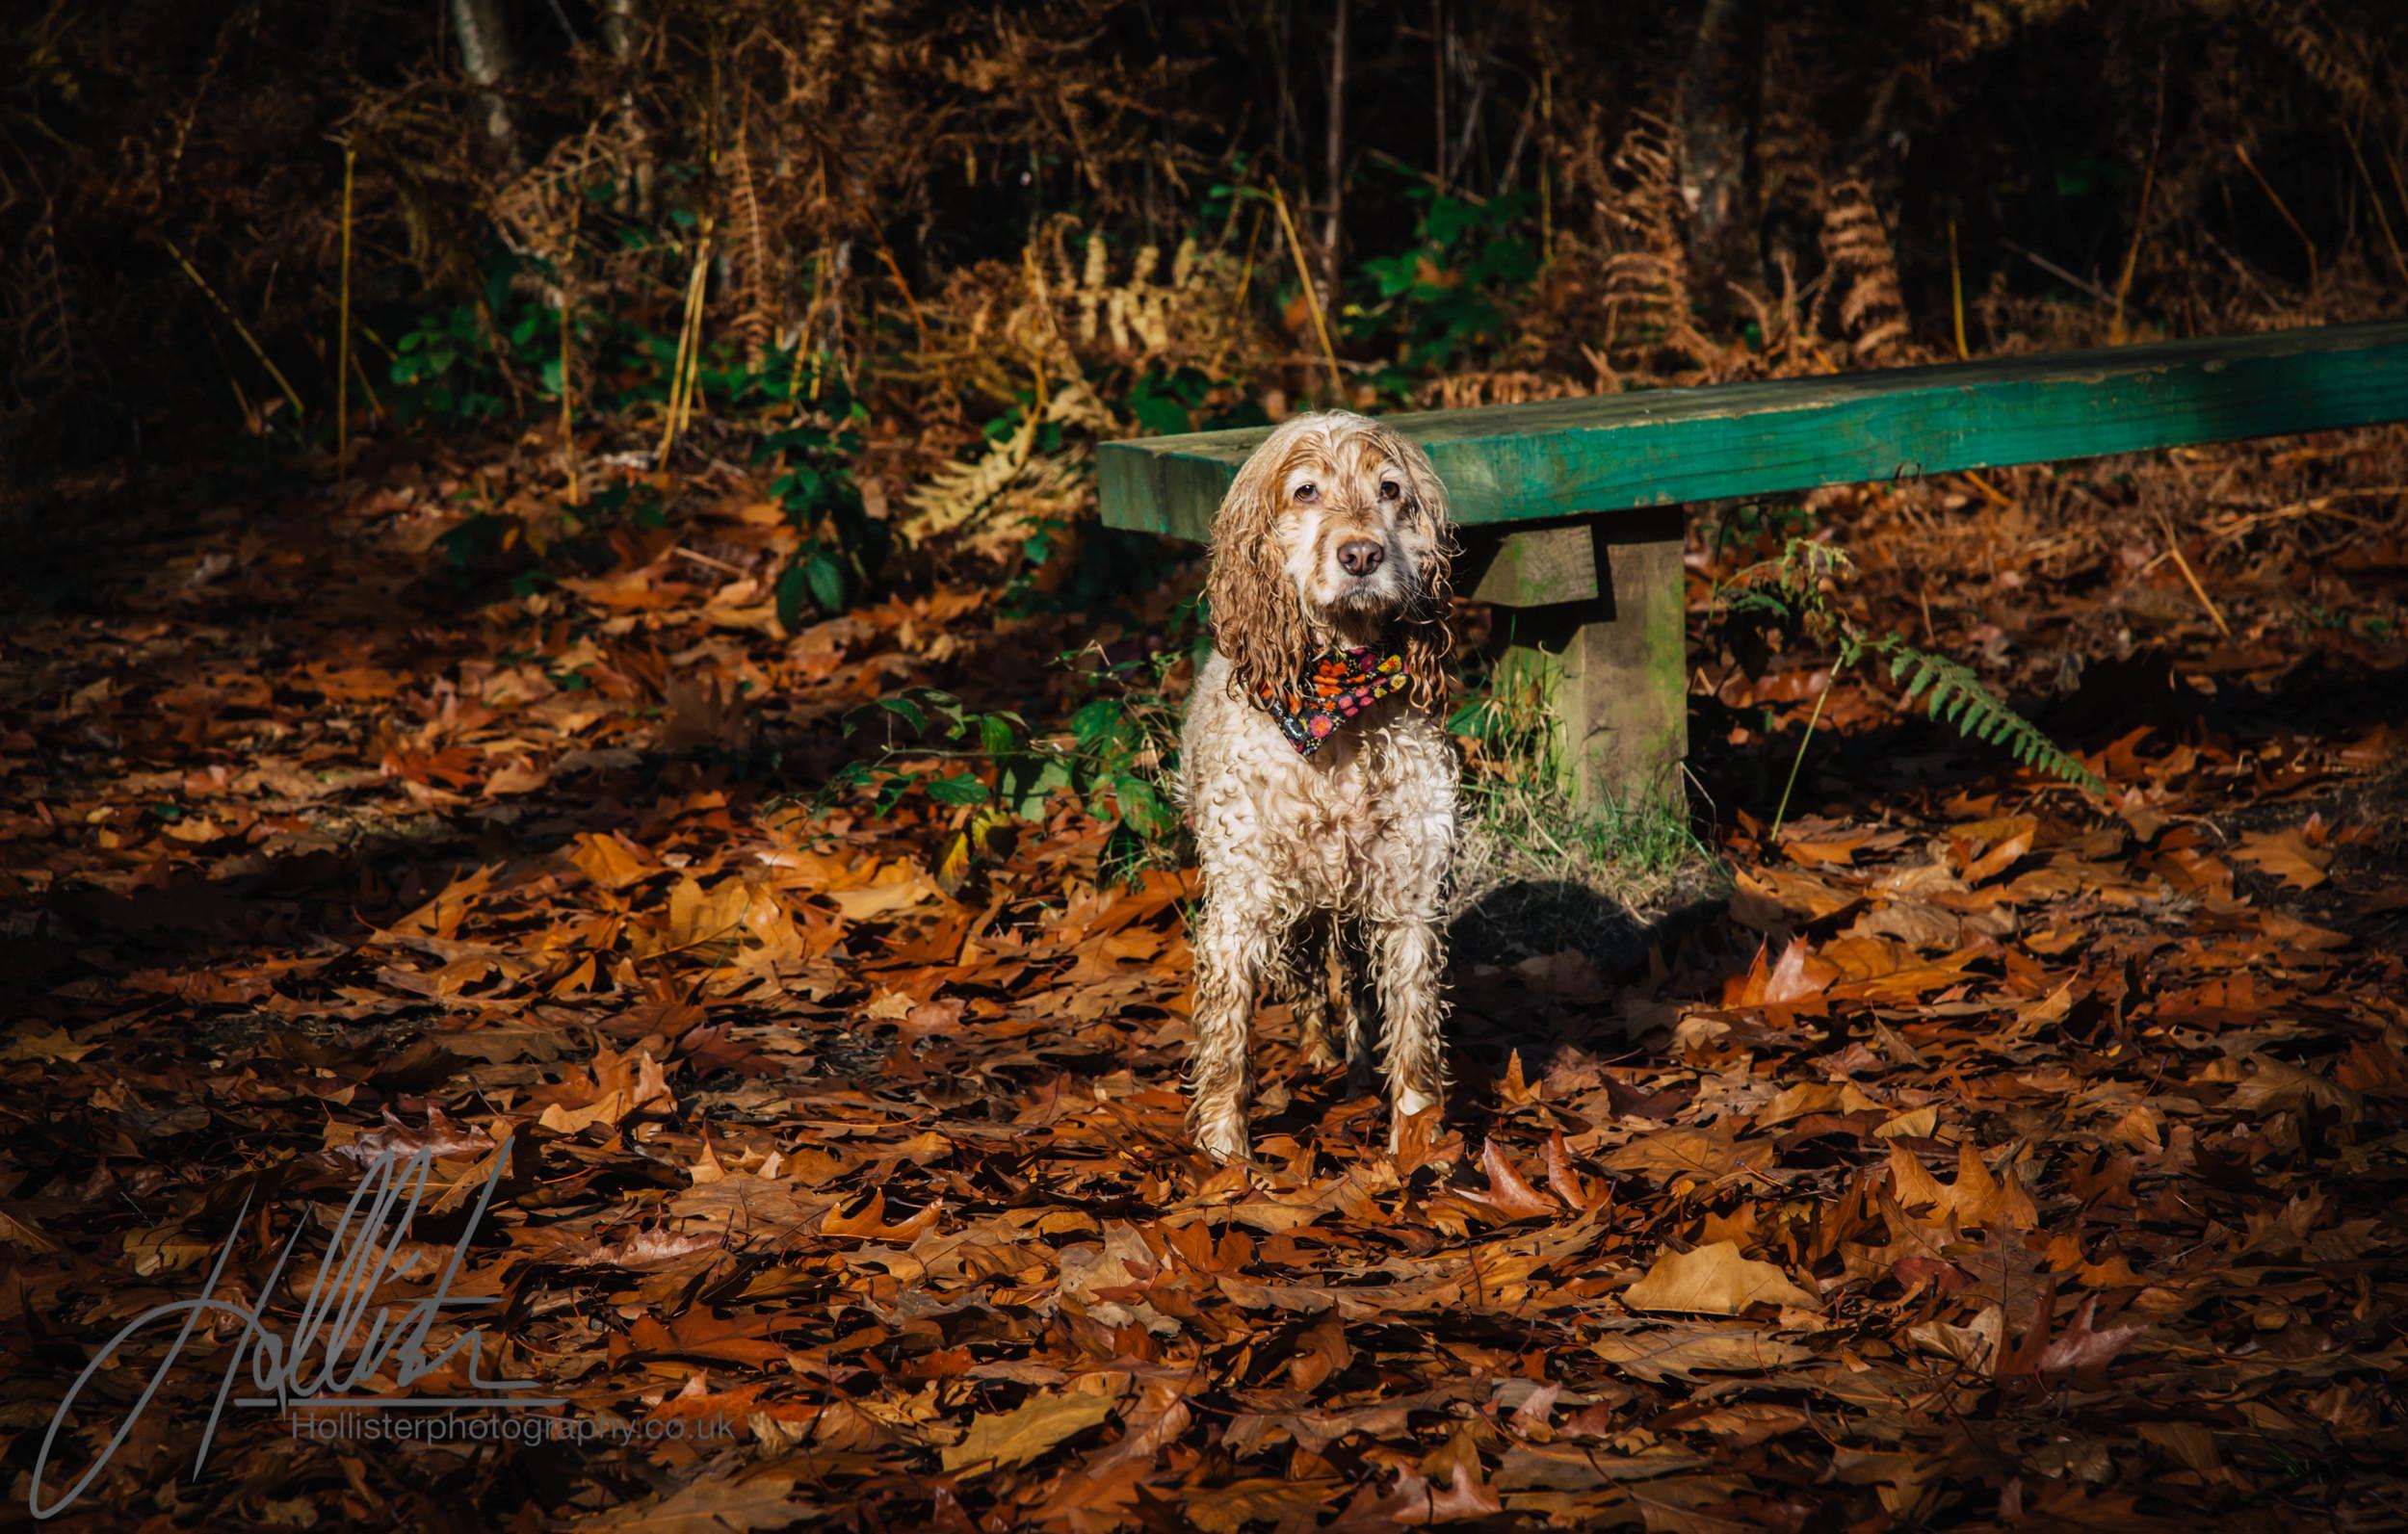 Hollisterphotography ABBY CLOWES WOOD DOG WALK-69.JPG